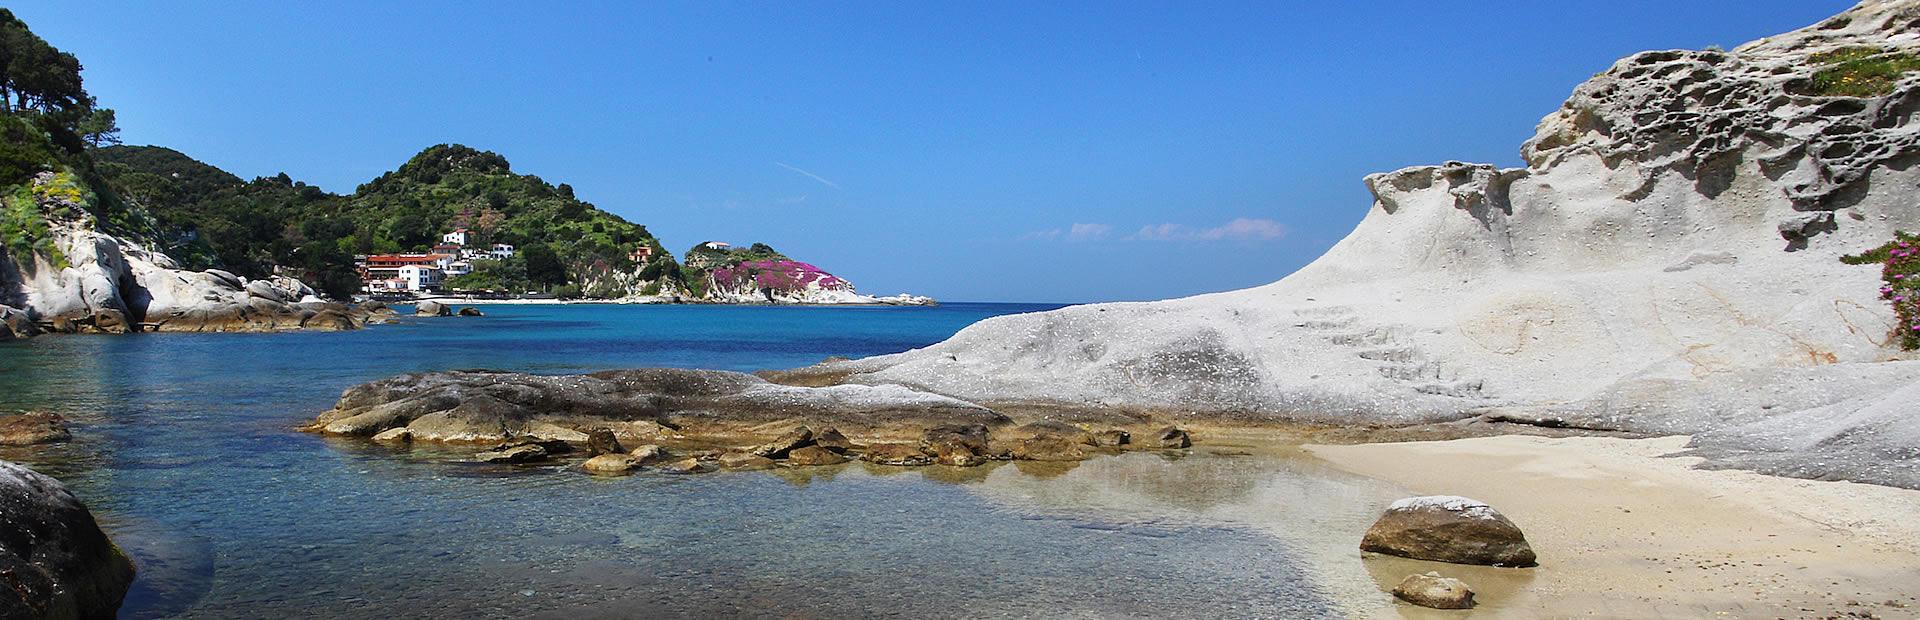 Capo Sant'Andrea, Elba Island: Tourist Info and Tips